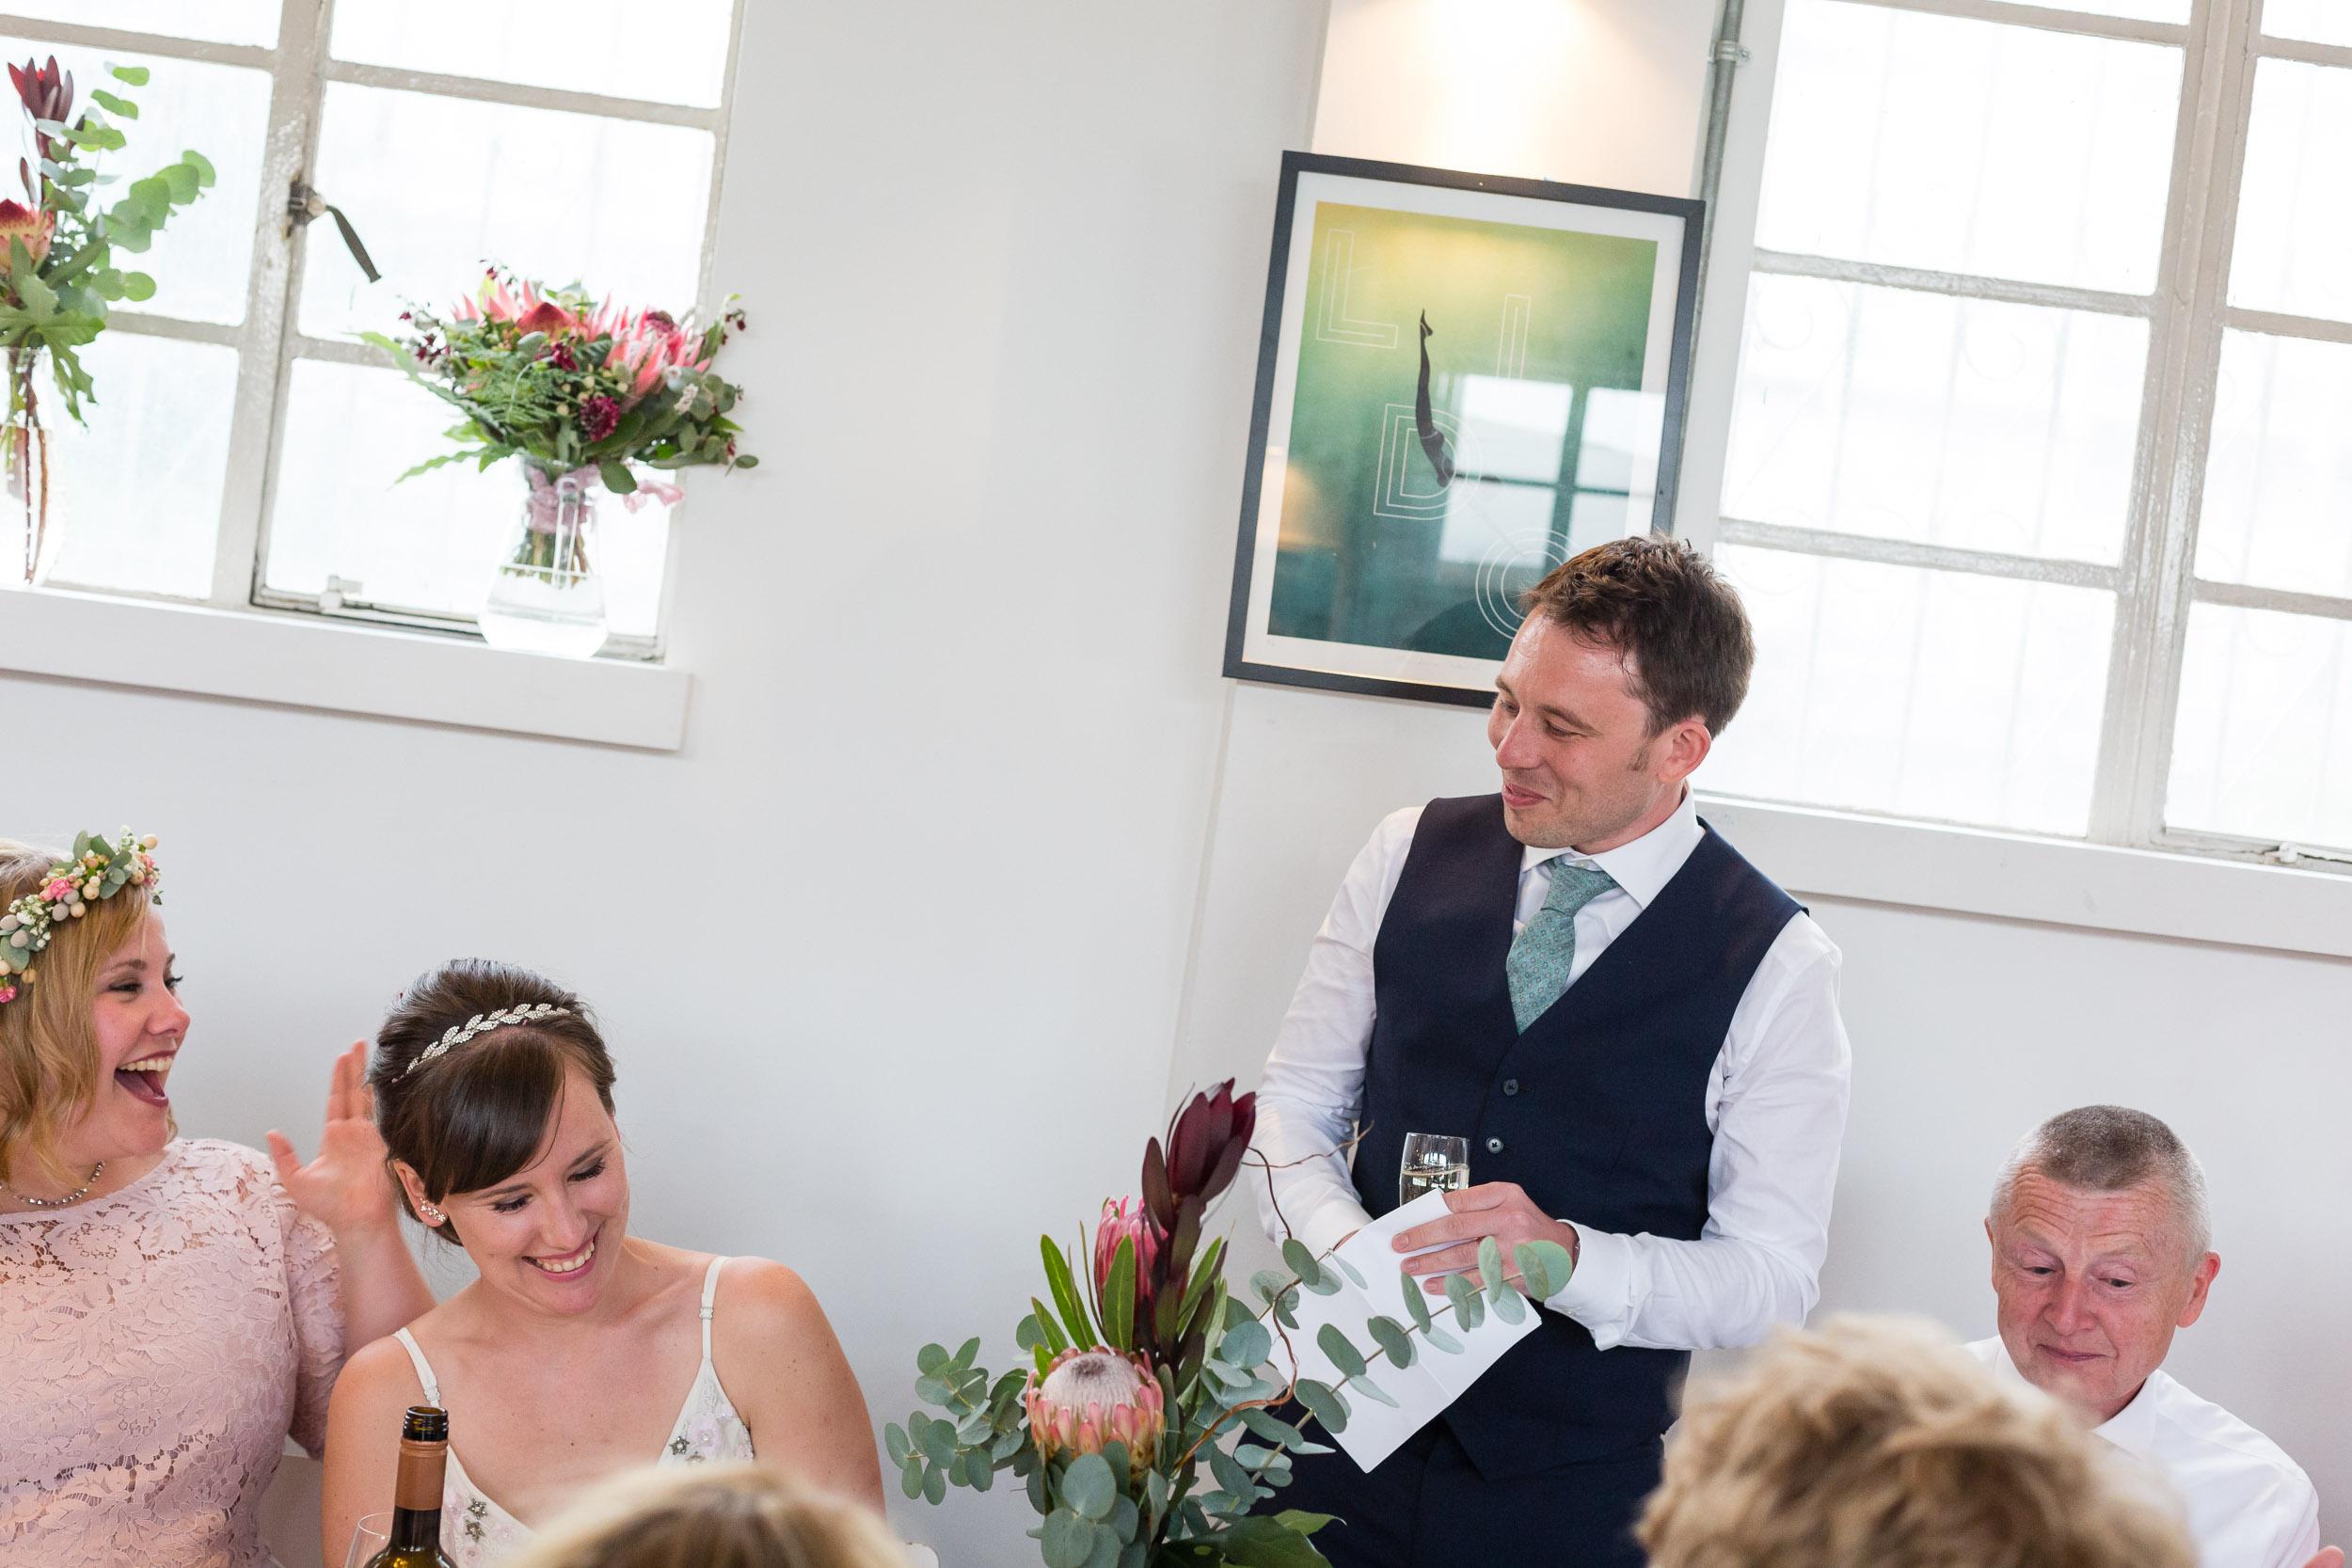 brockwell-lido-brixton-herne-hill-wedding-336.jpg